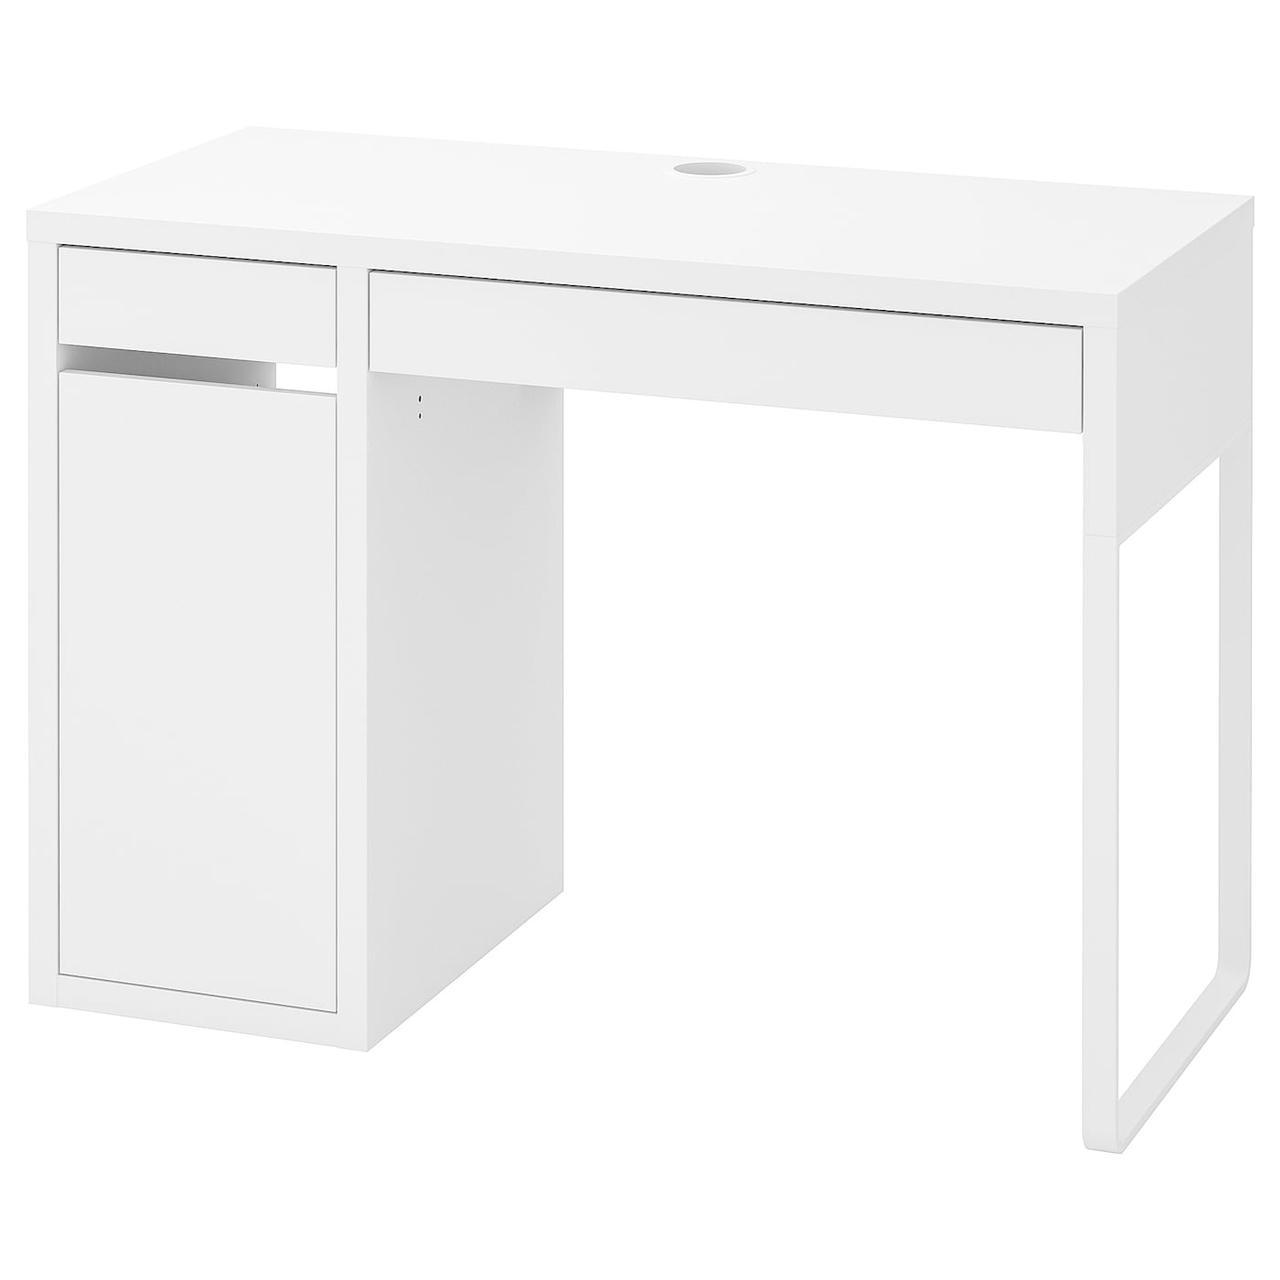 IKEA MICKE Письменный стол, 105x50 см